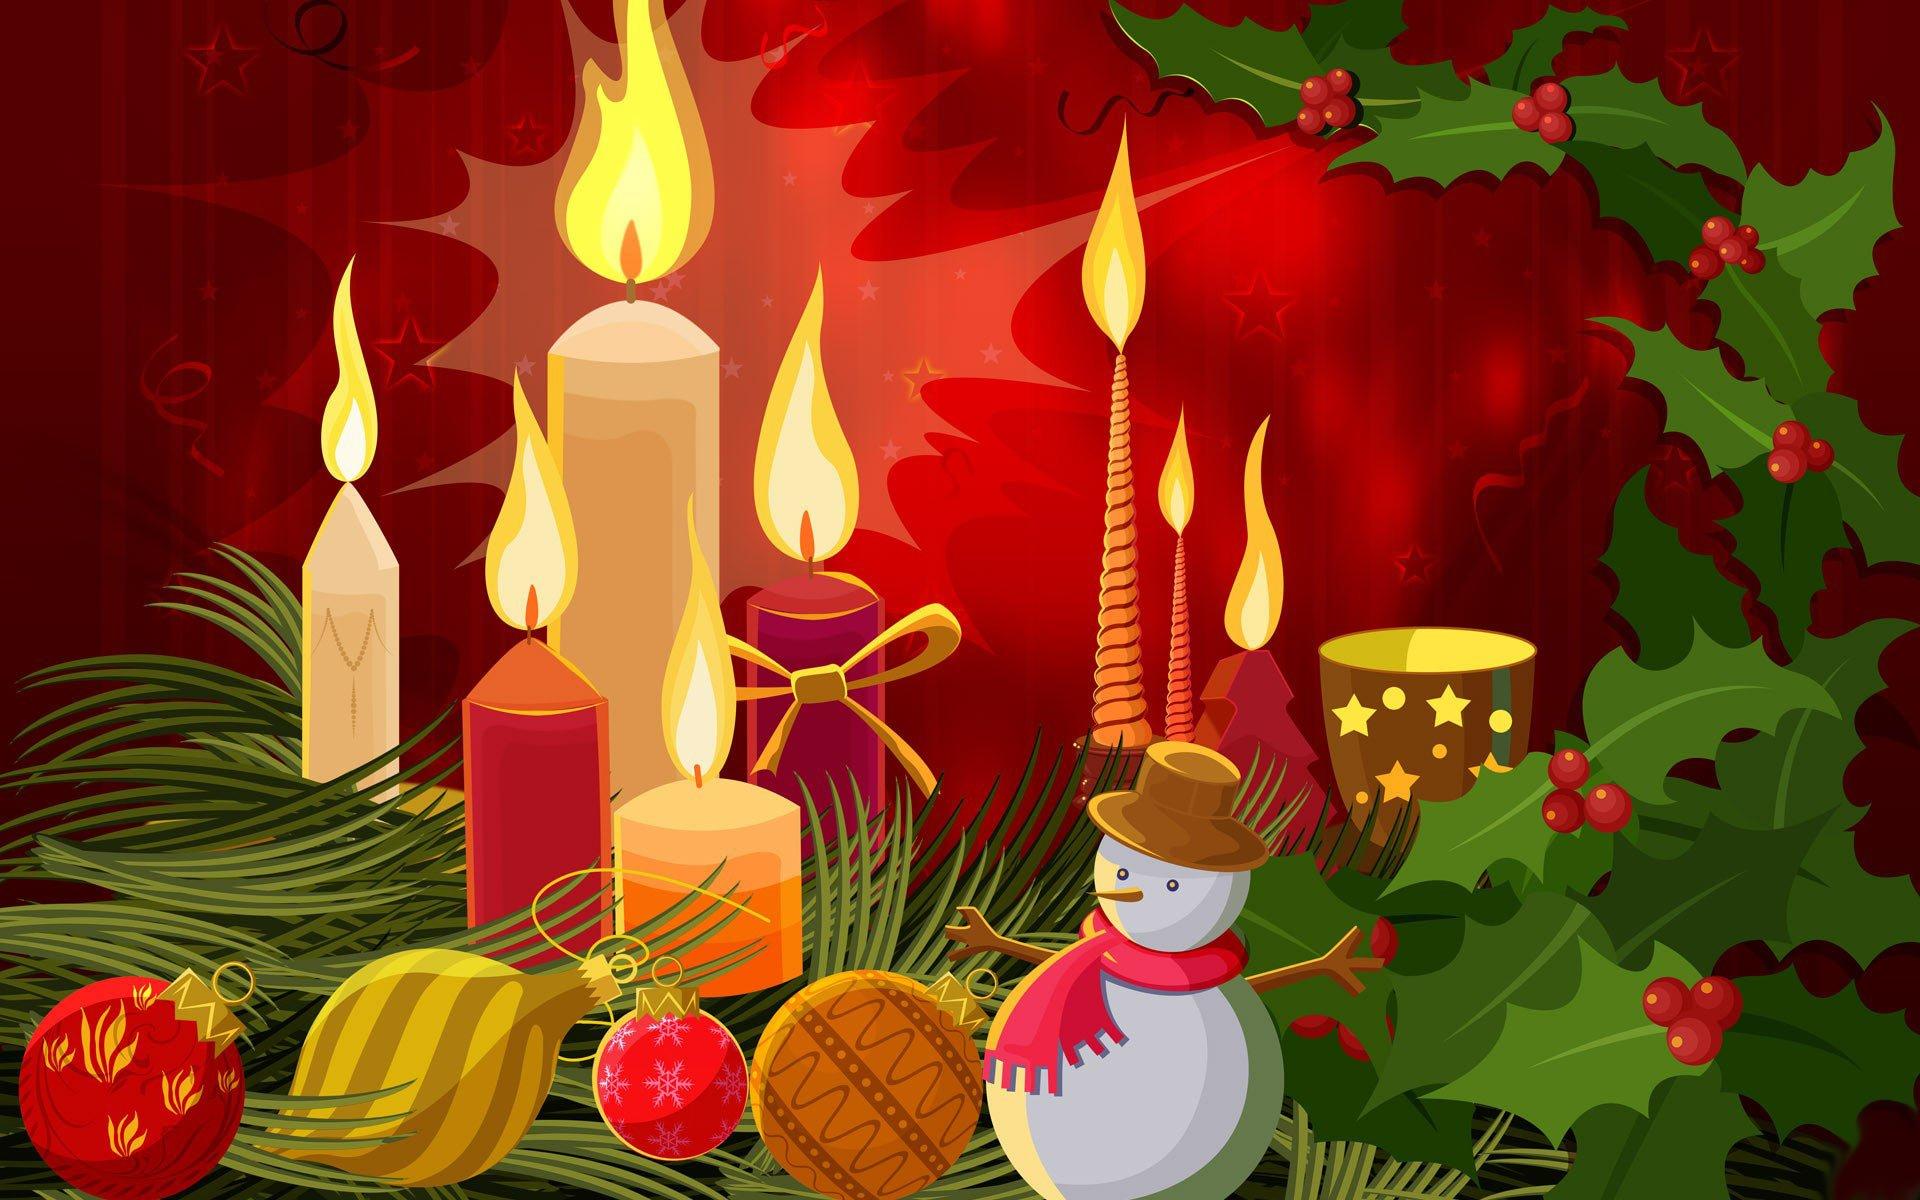 Merry Christmas background Desktop Wallpaper | High Quality Wallpapers ...